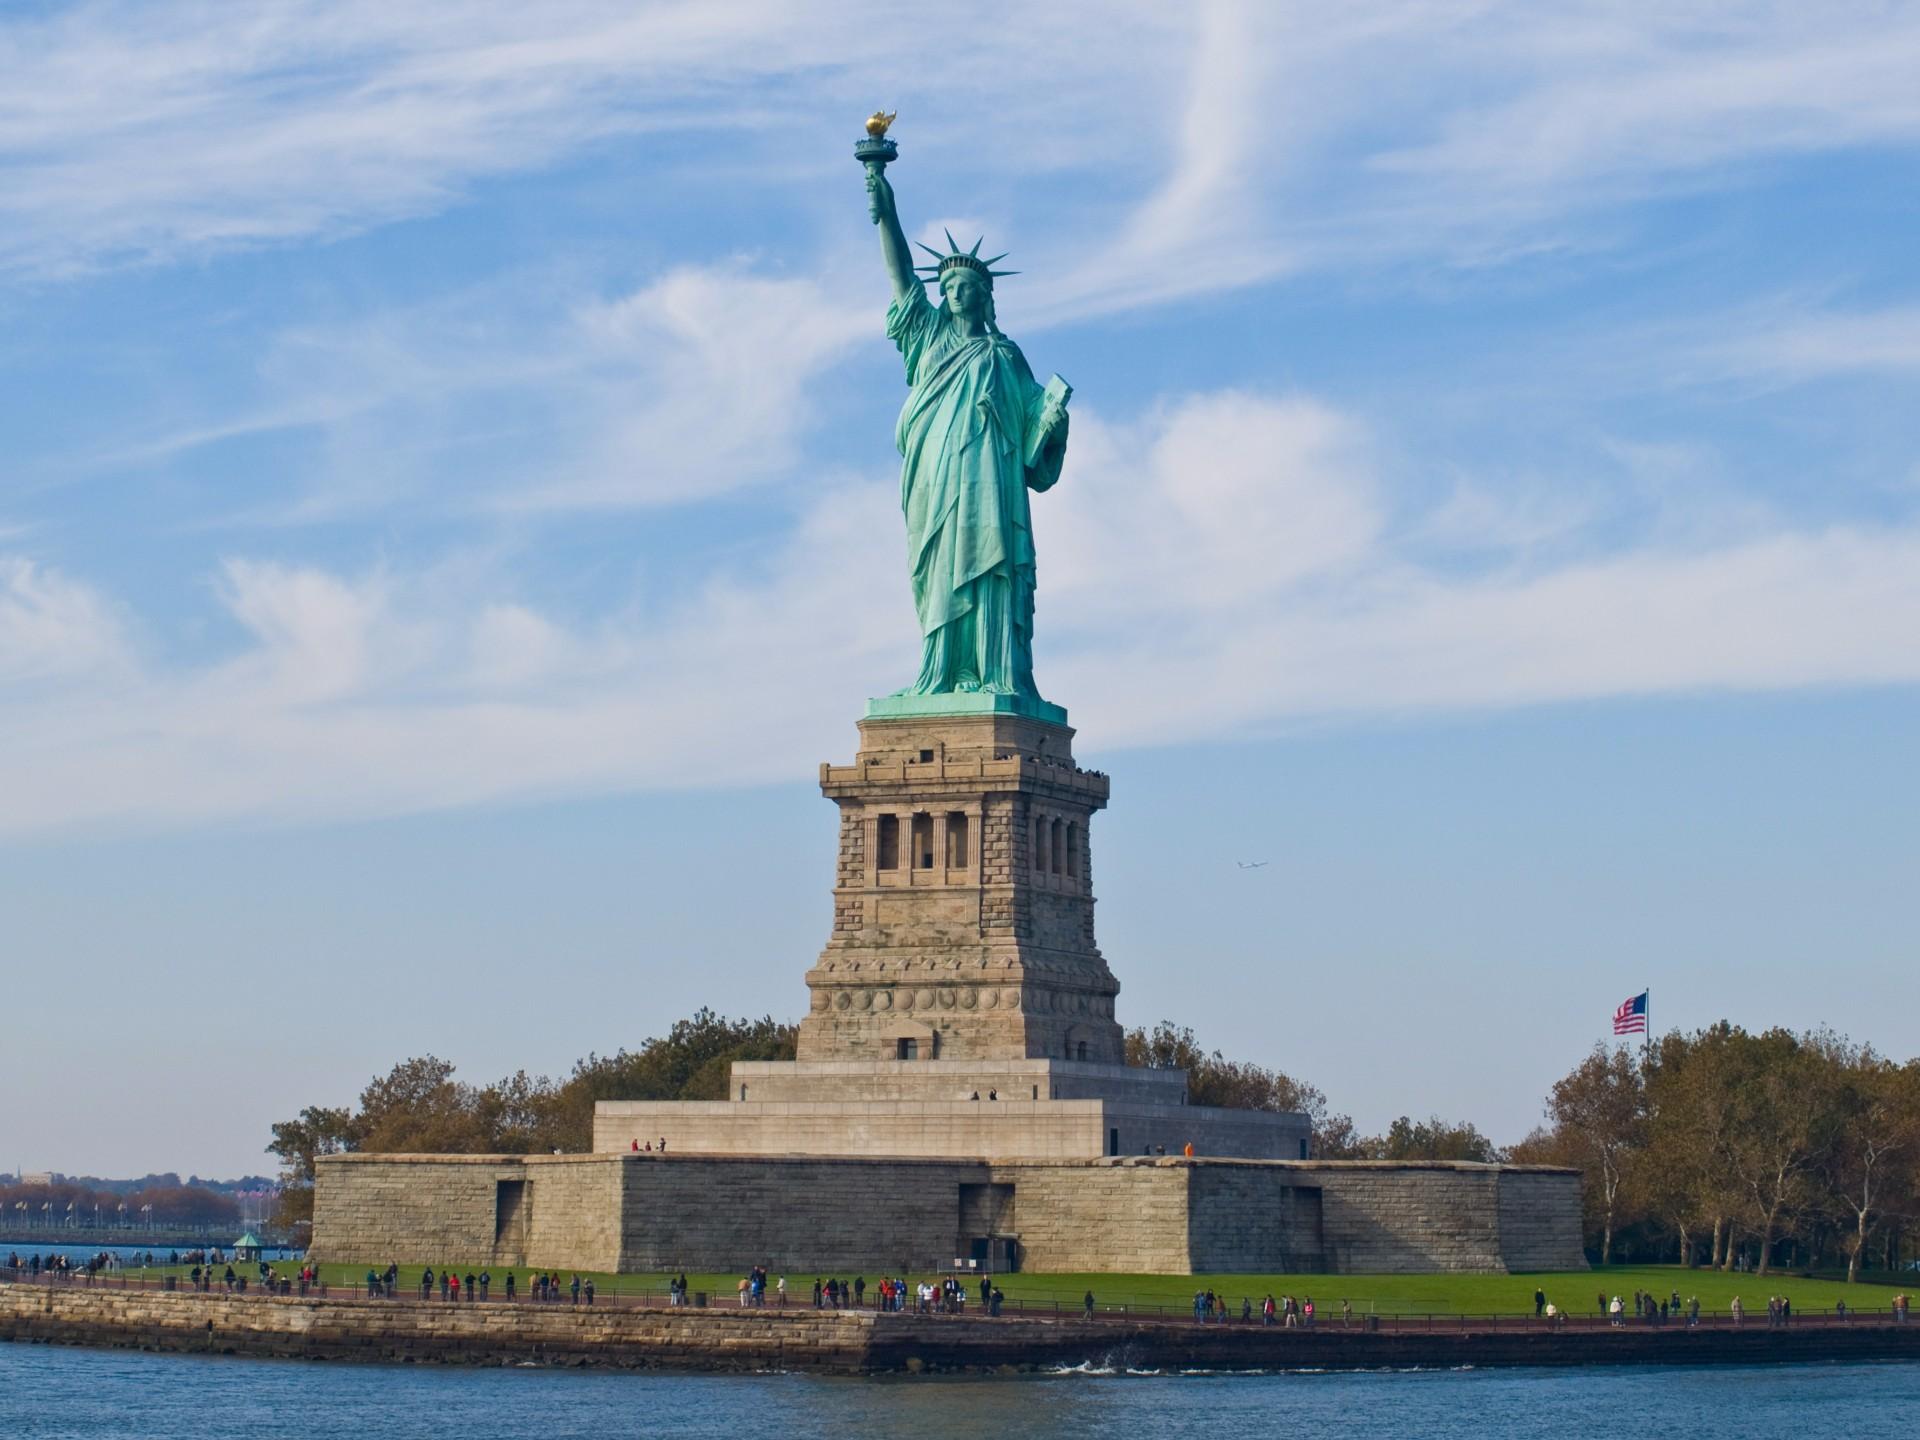 New York City Population in 2017